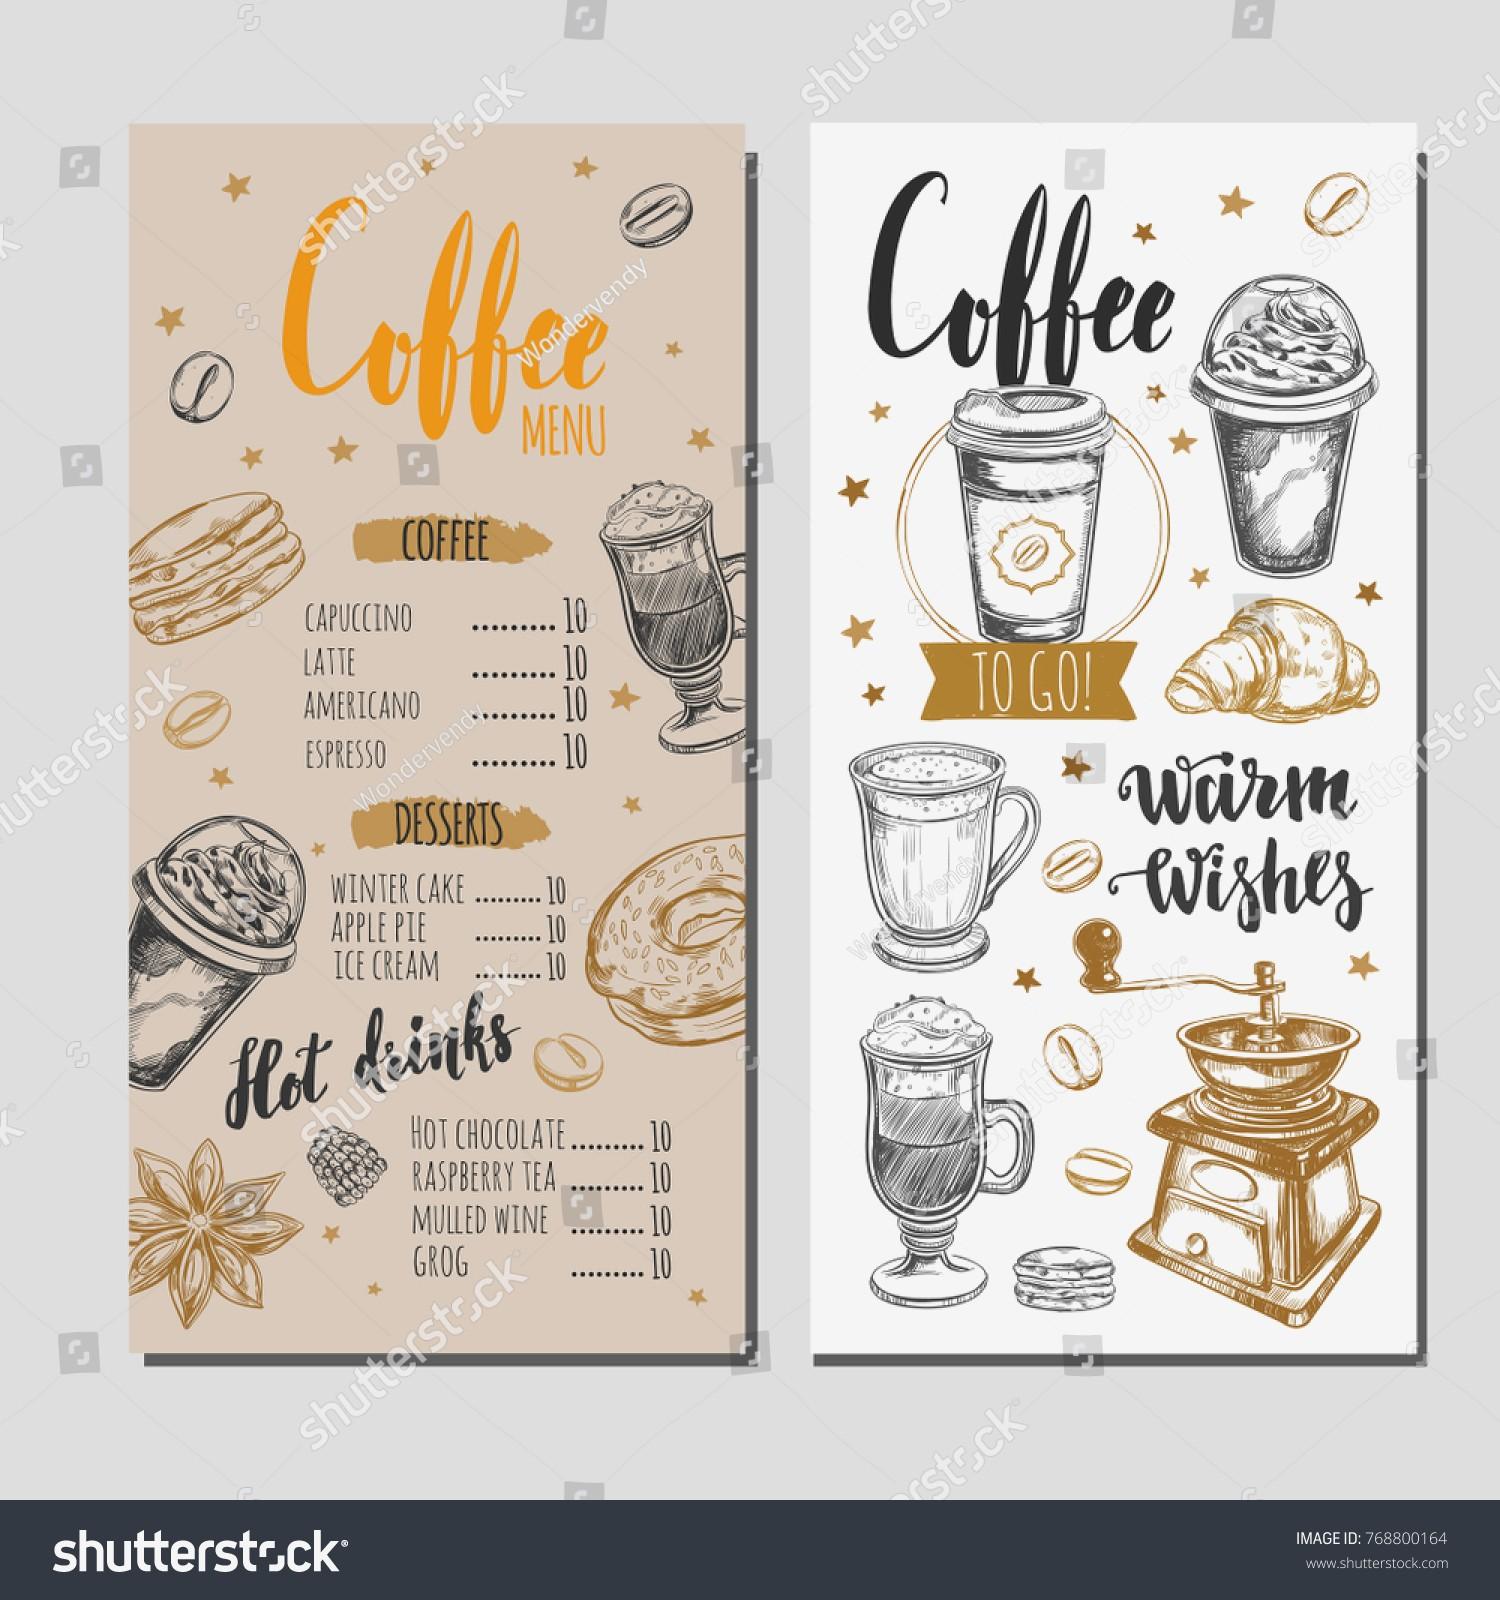 1500x1600 Bakery Brochure Template Free Best Of Coffee Bakery Restaurant